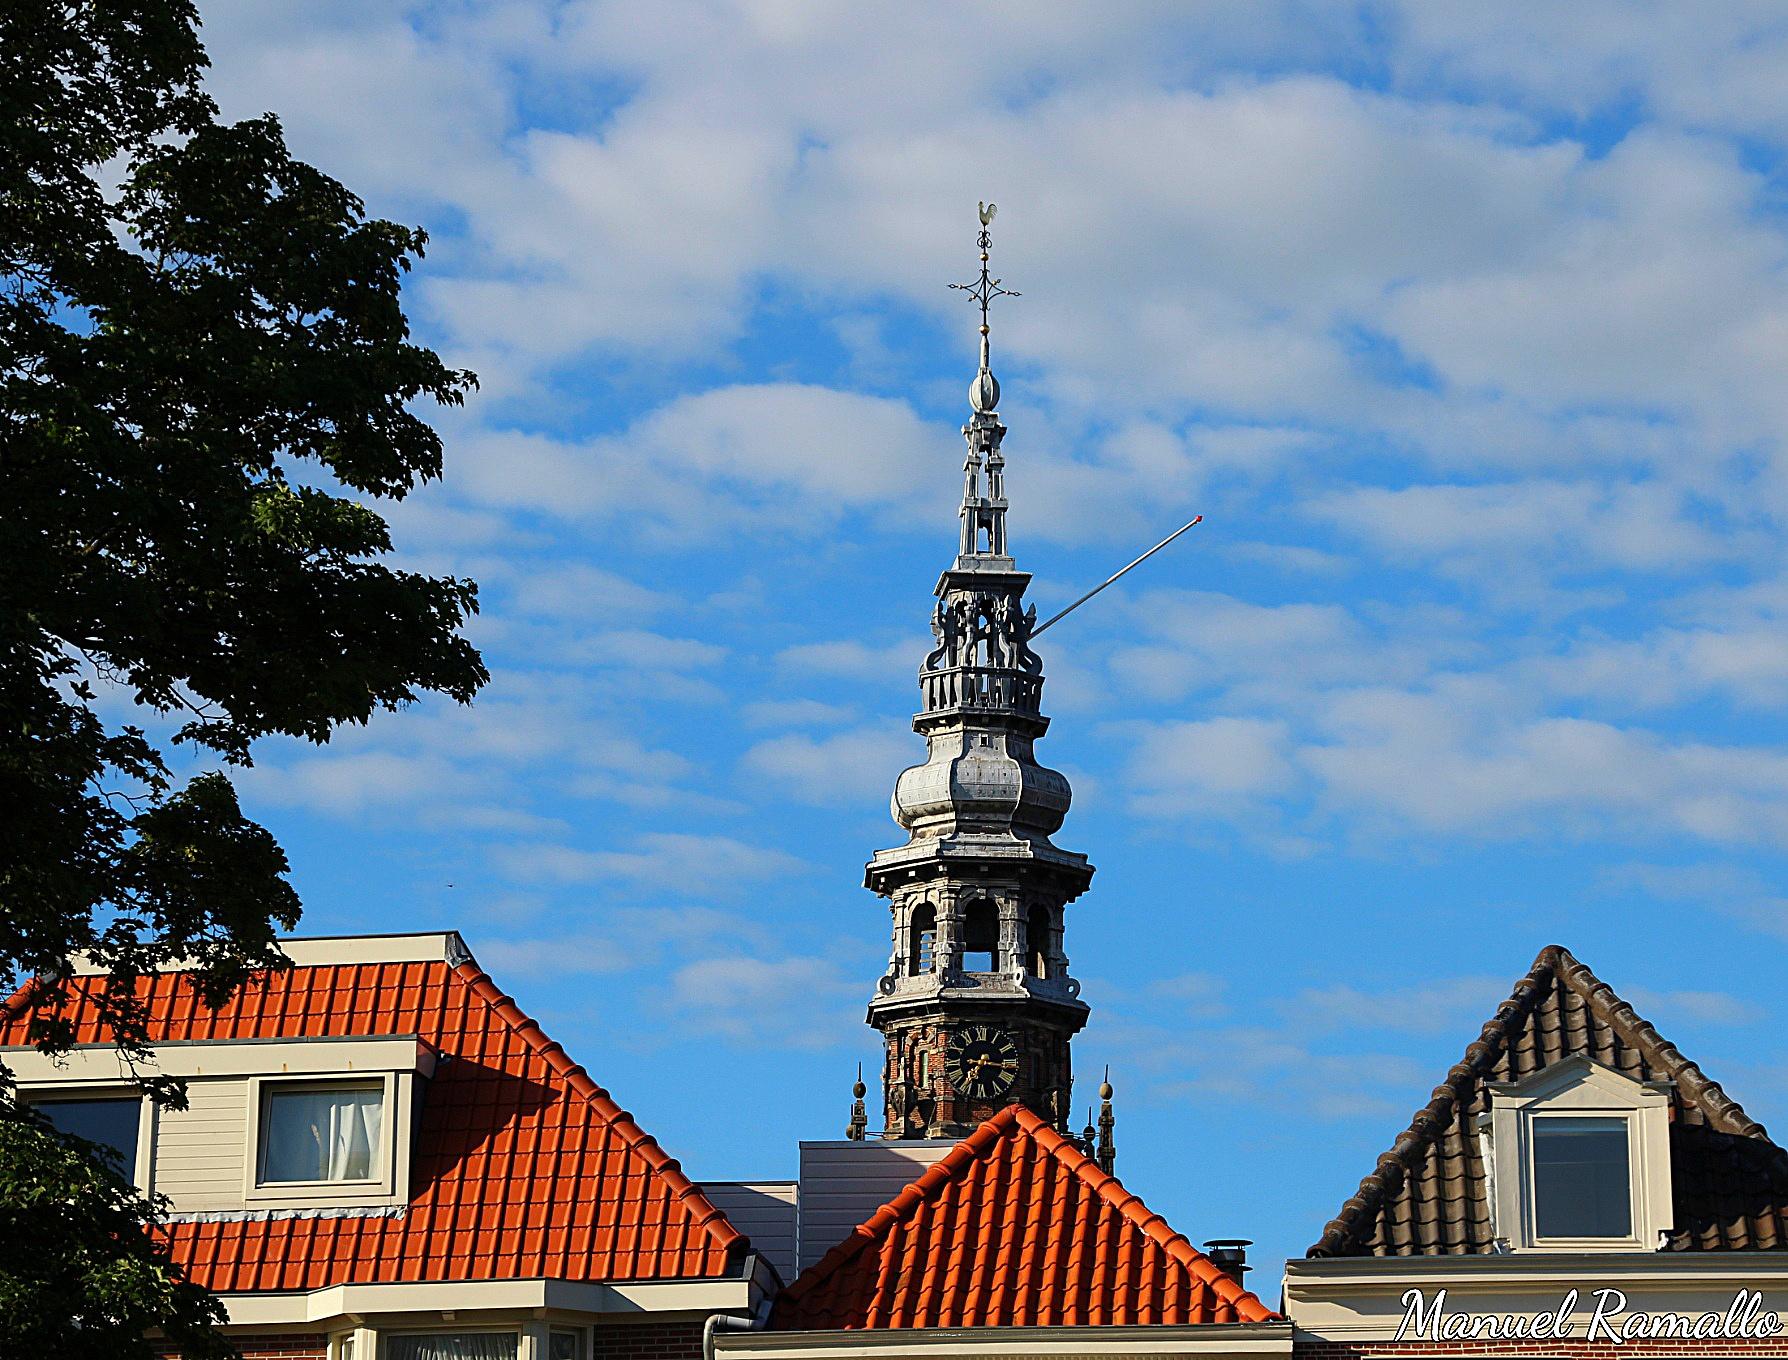 torre-reloj-haarlem-holanda-paises-bajos